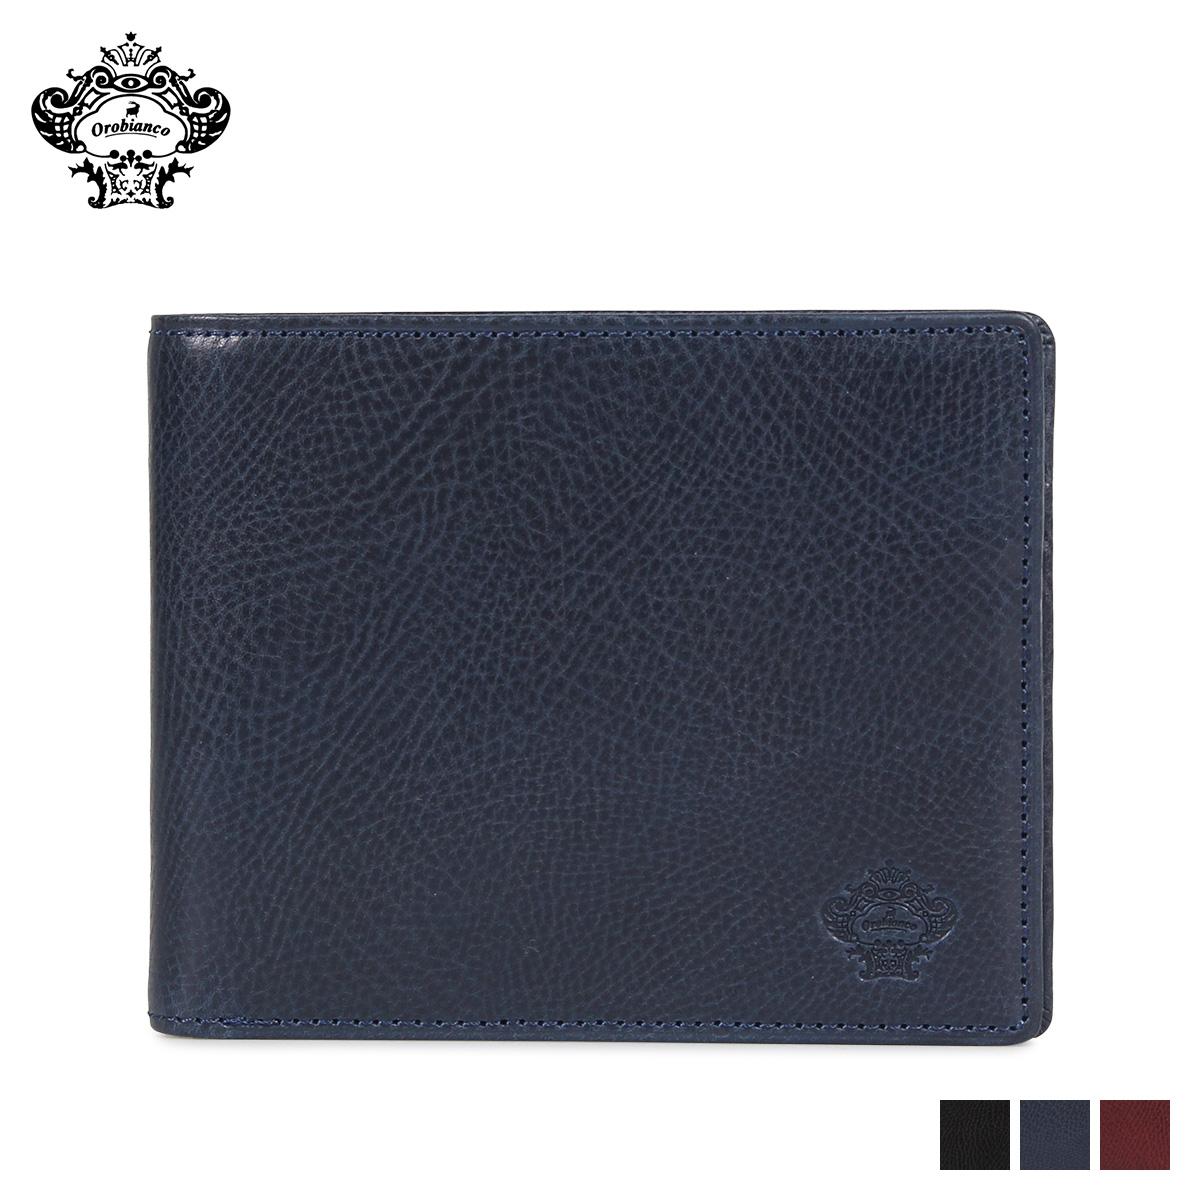 Orobianco BI-FOLD WALLET オロビアンコ 財布 二つ折り メンズ 本革 ブラック ネイビー ワイン 黒 ORS-031408